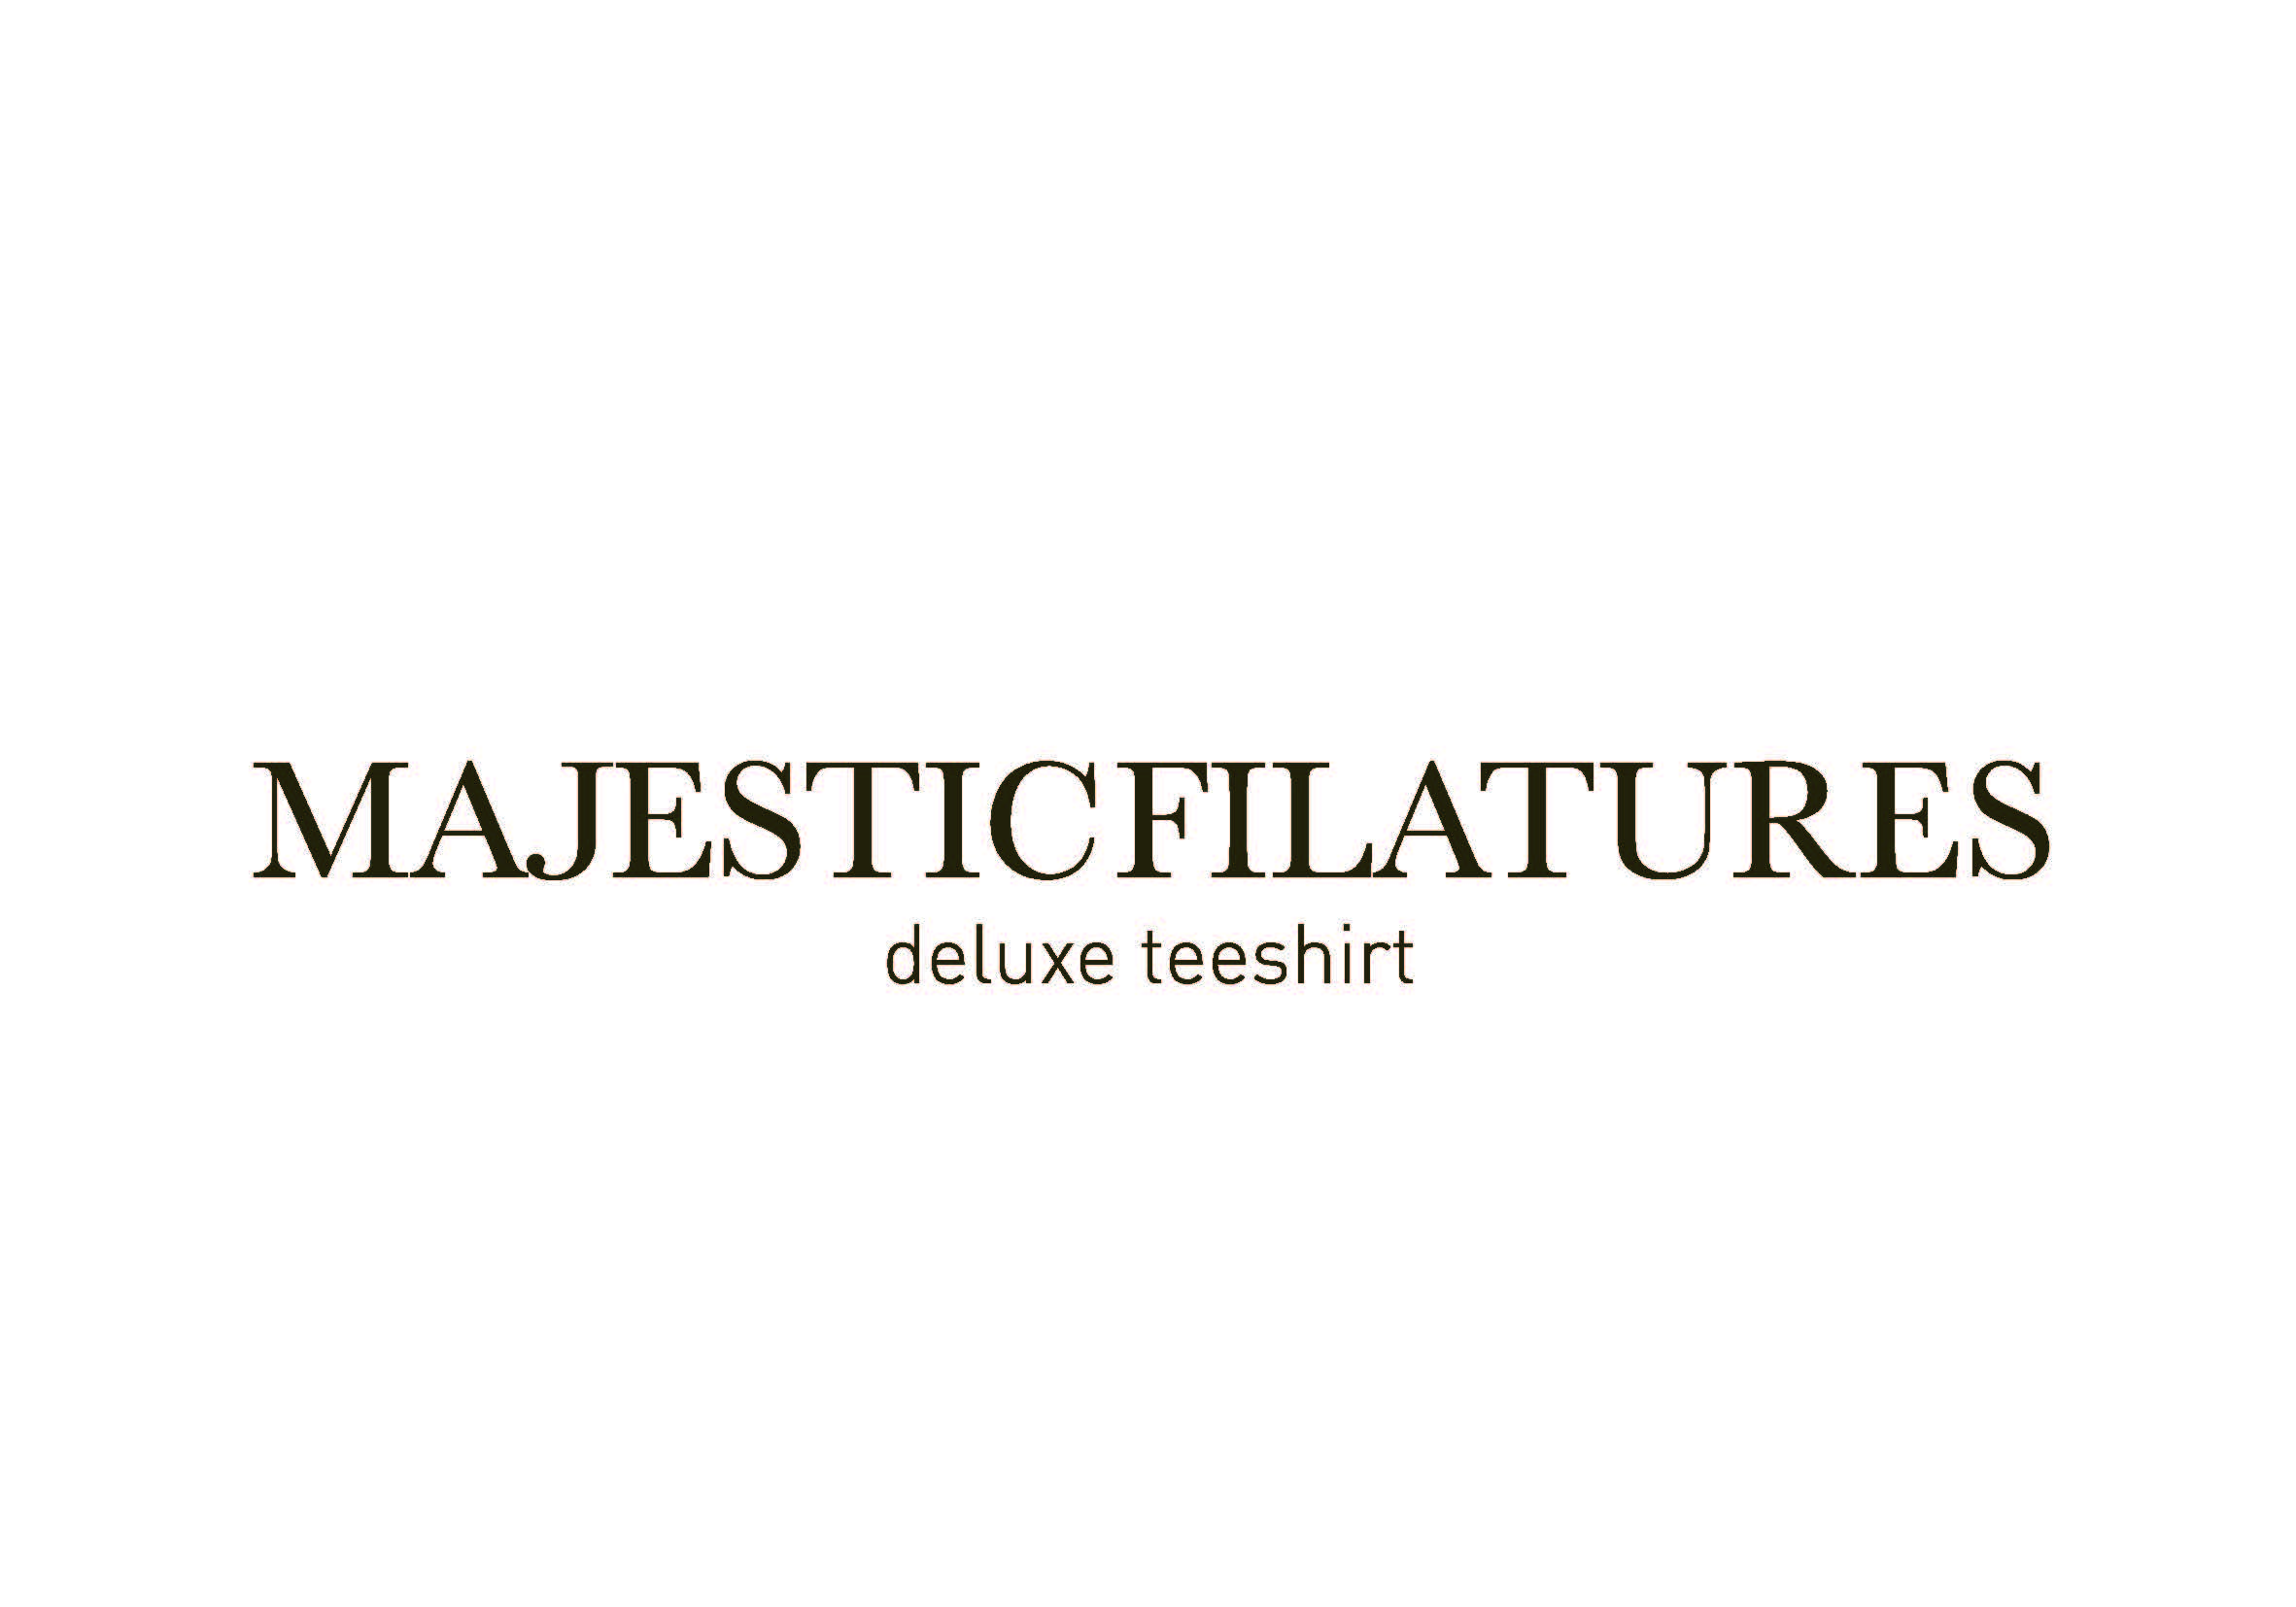 majesticlogo.jpg